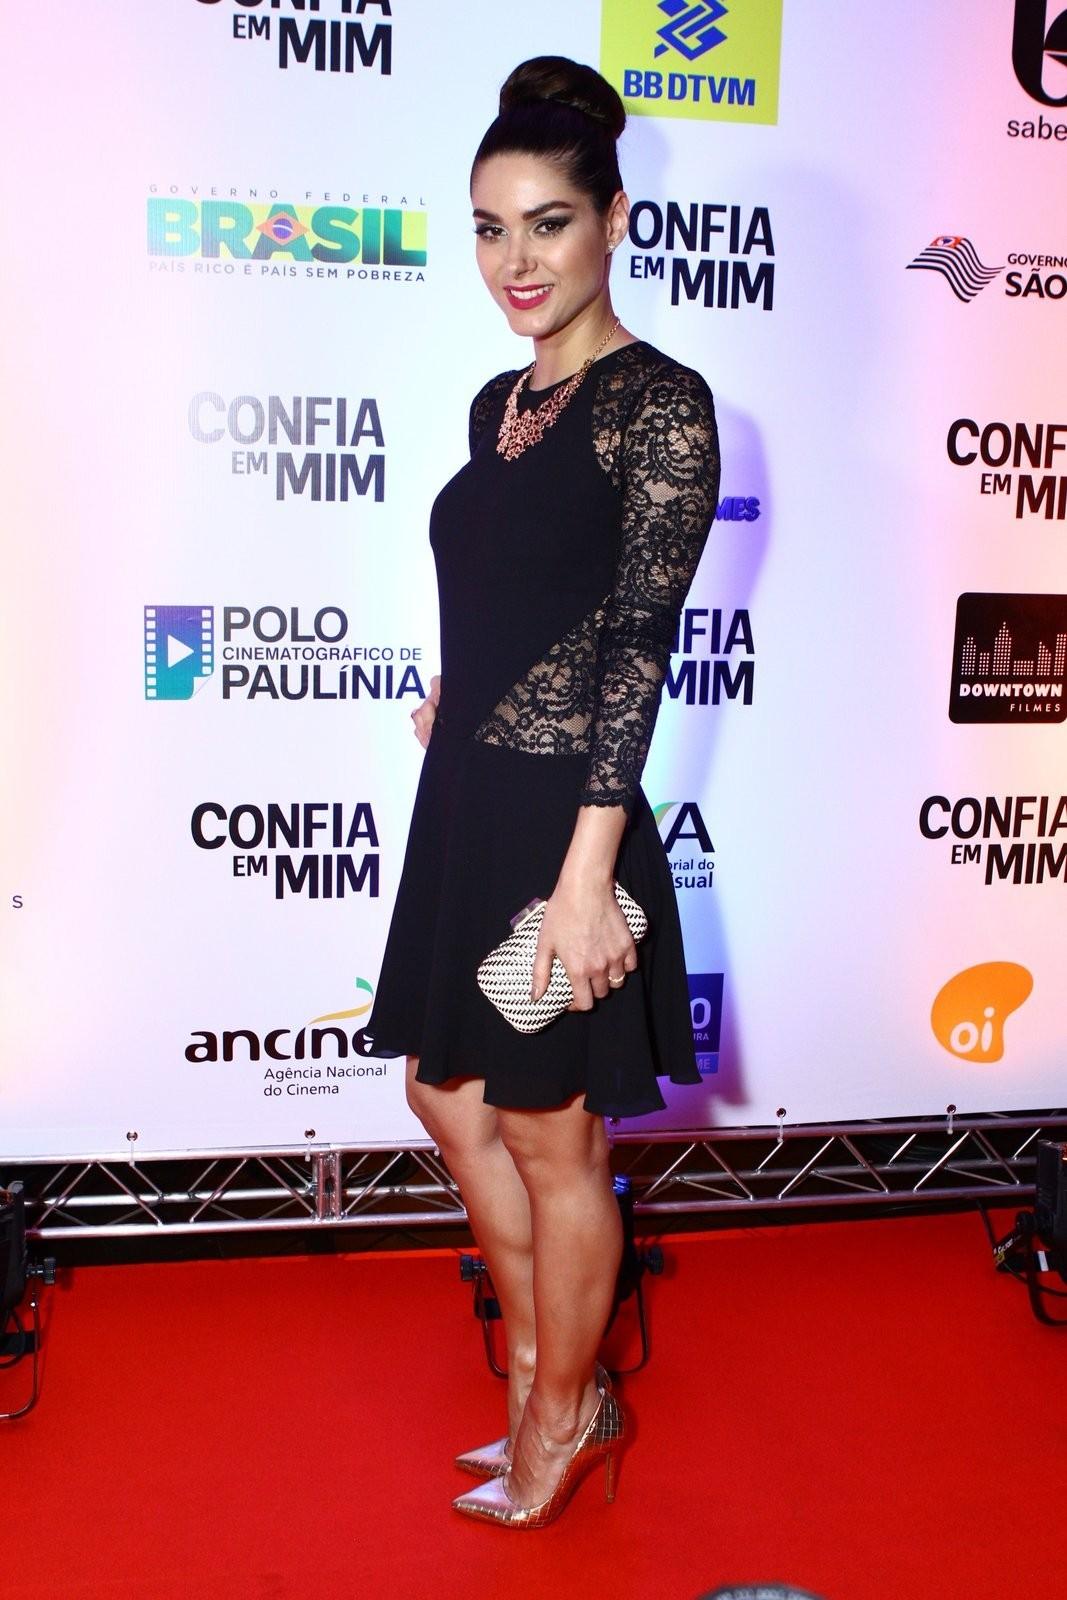 http://pics.wikifeet.com/Fernanda-Machado-Feet-1576397.jpg